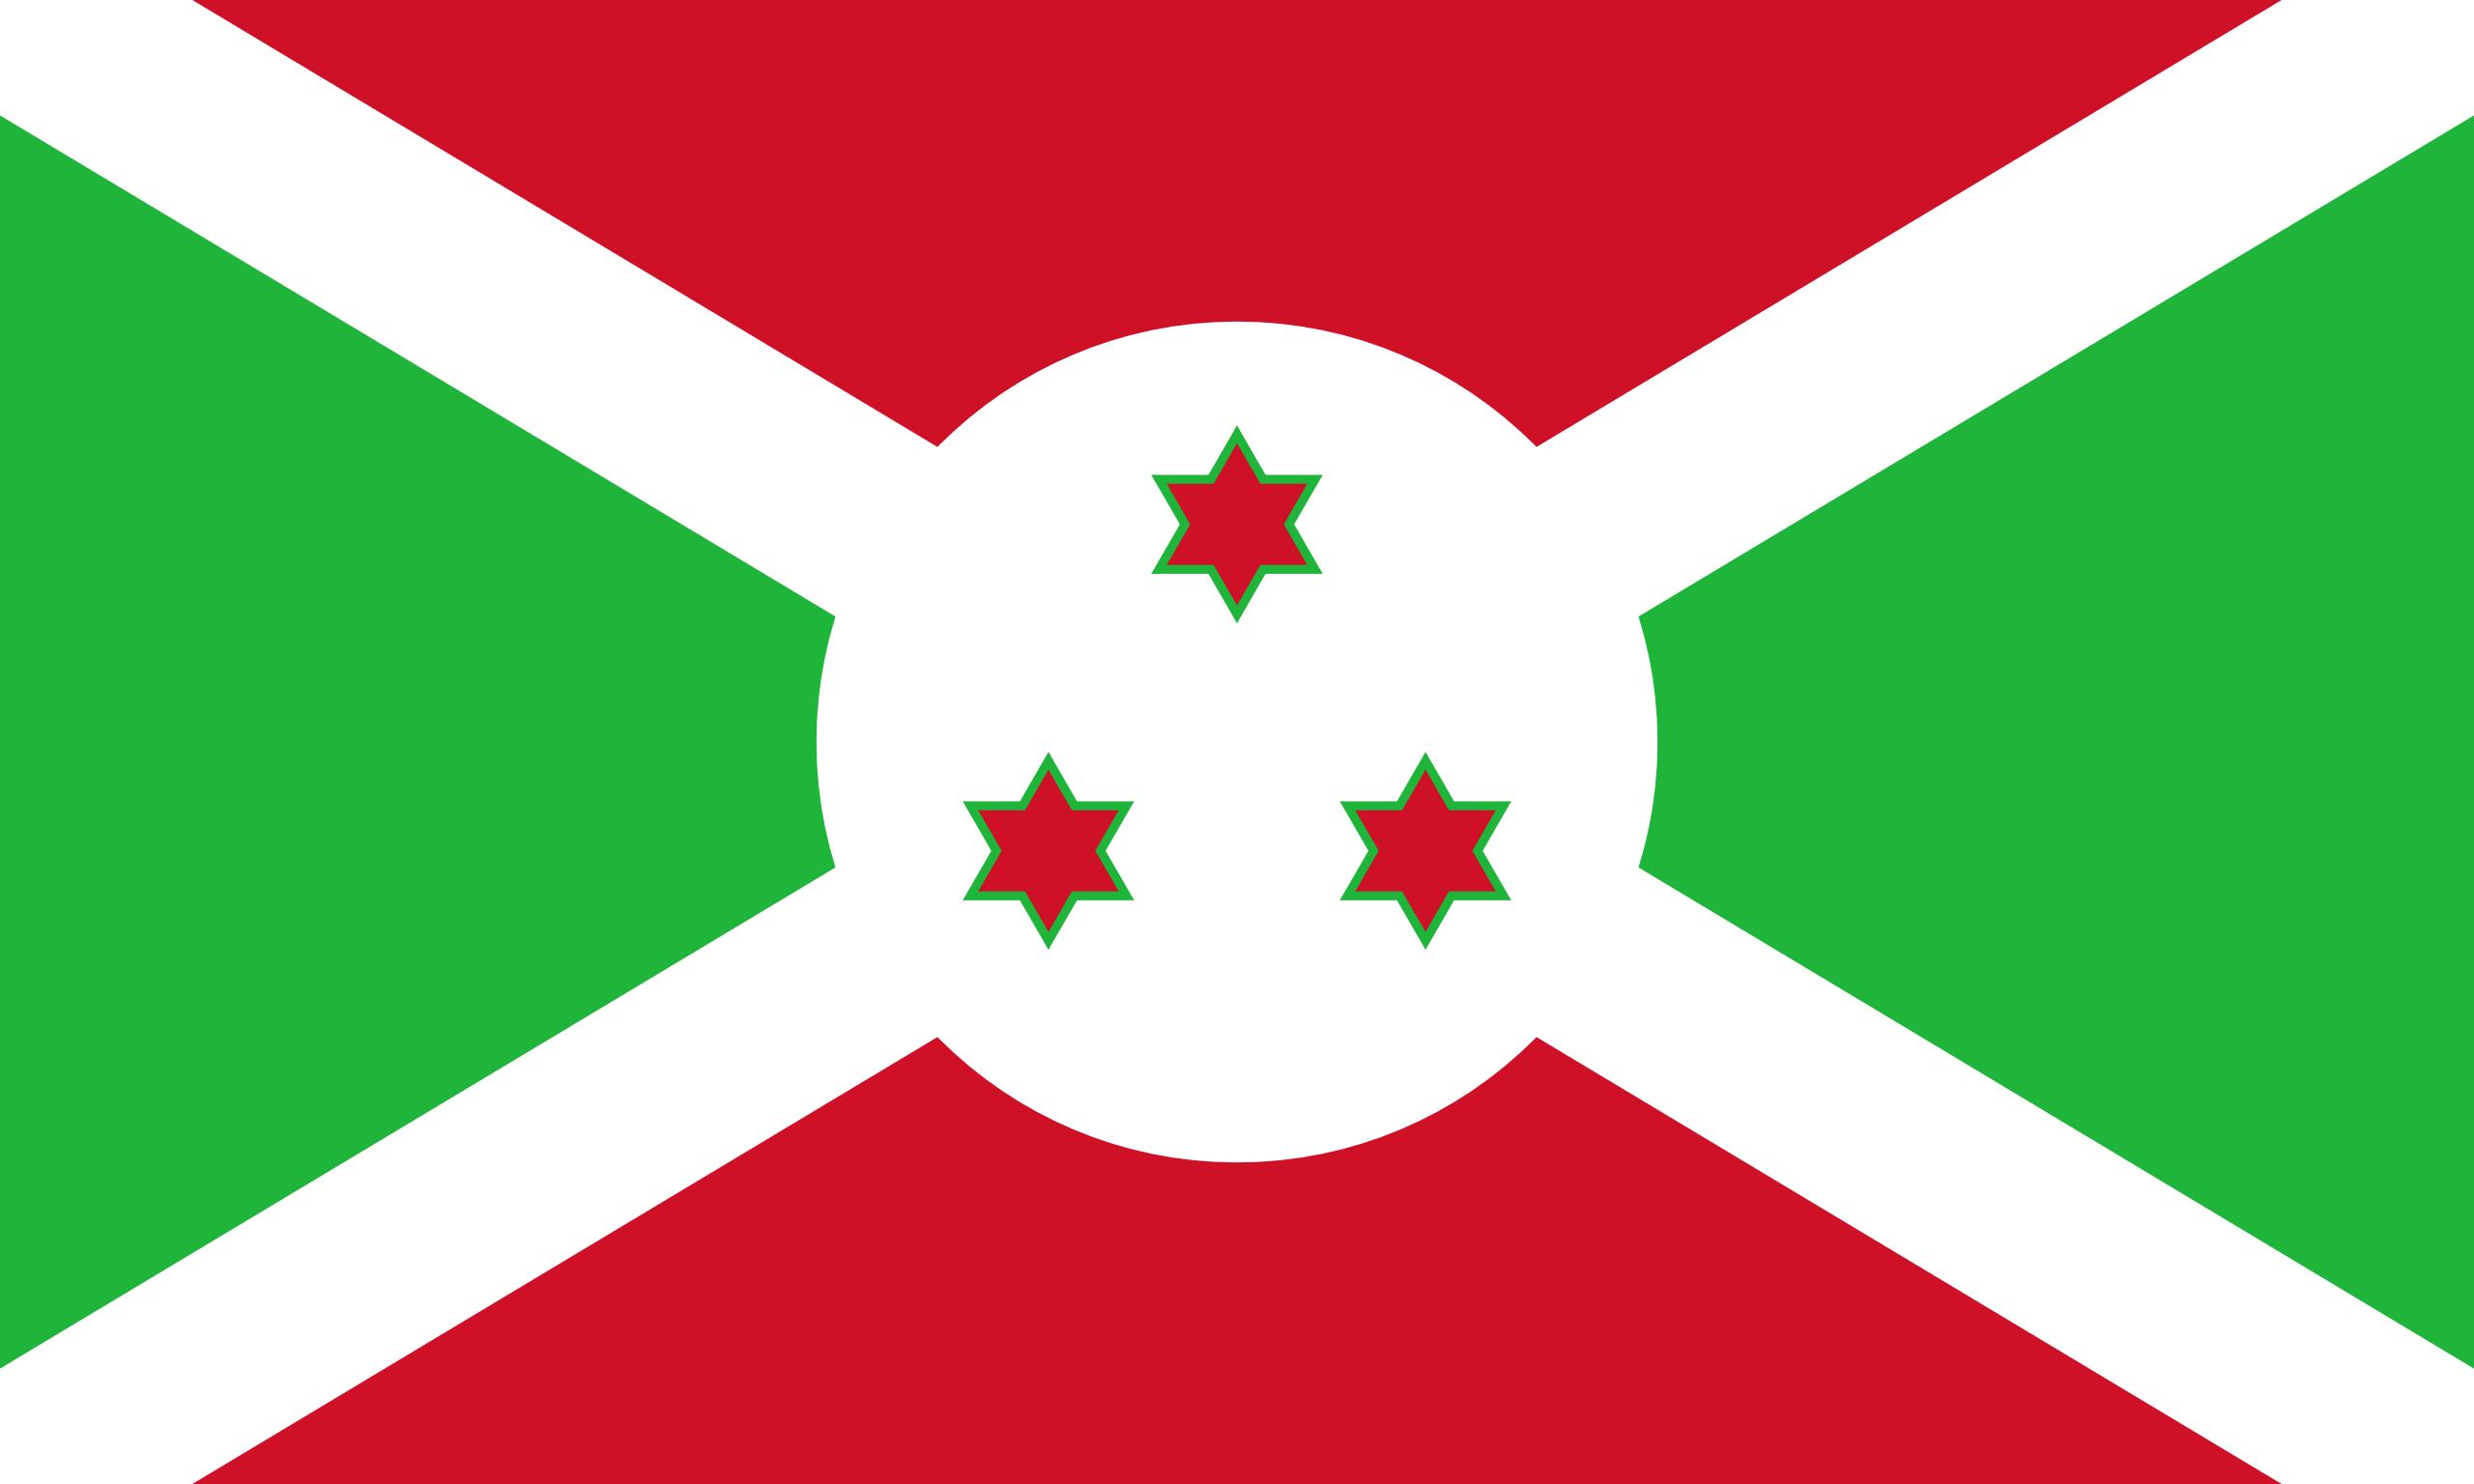 burundi, paese, emblema, logo, simbolo - Sfondi HD - Professor-falken.com